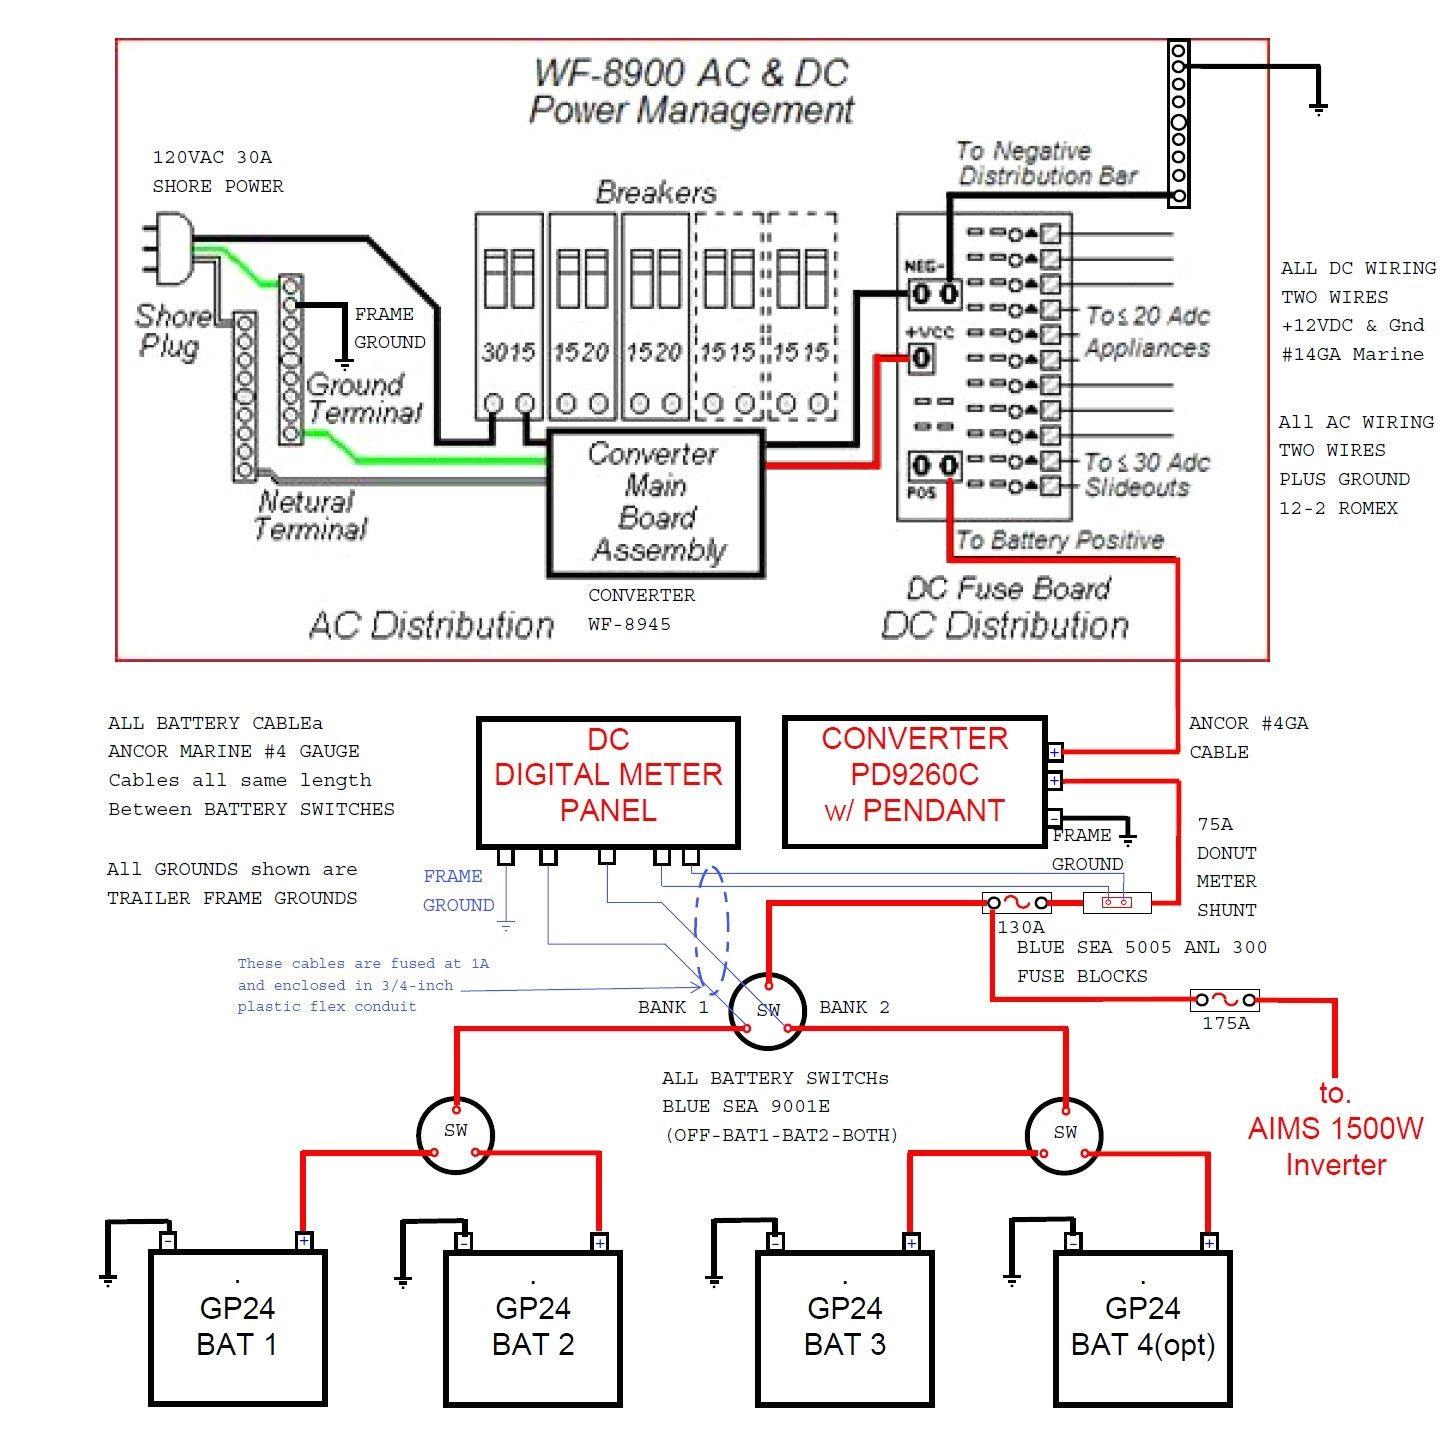 30 Amp Transfer Switch Wiring Diagram 30 Amp Rv Converter Wiring Diagram Wiring Diagram Page